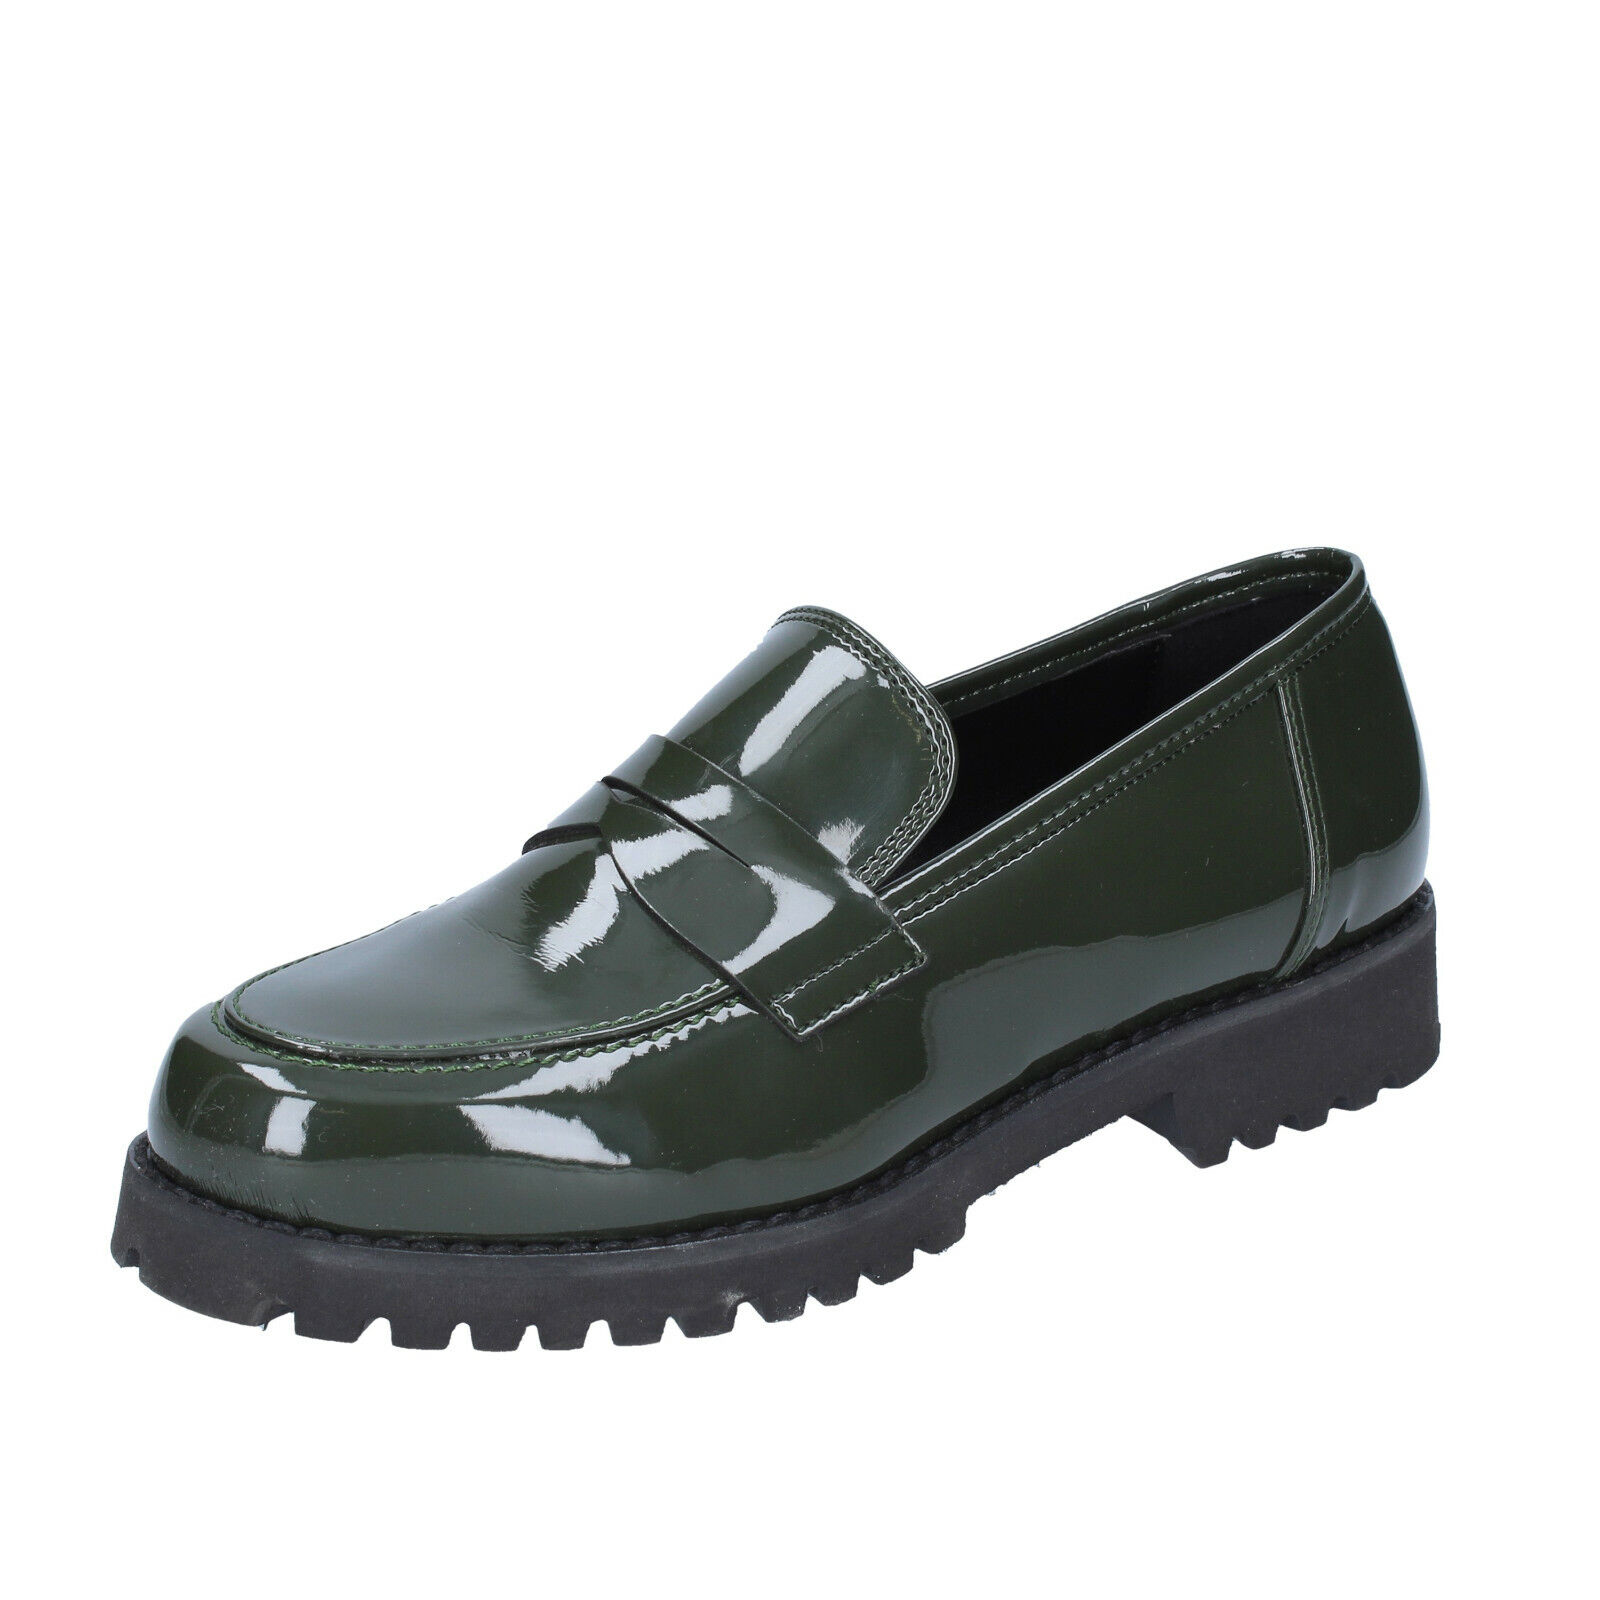 Chaussures femmes Olga Rubini 6 (UE 36) Mocassins vert cuir verni BS841-36